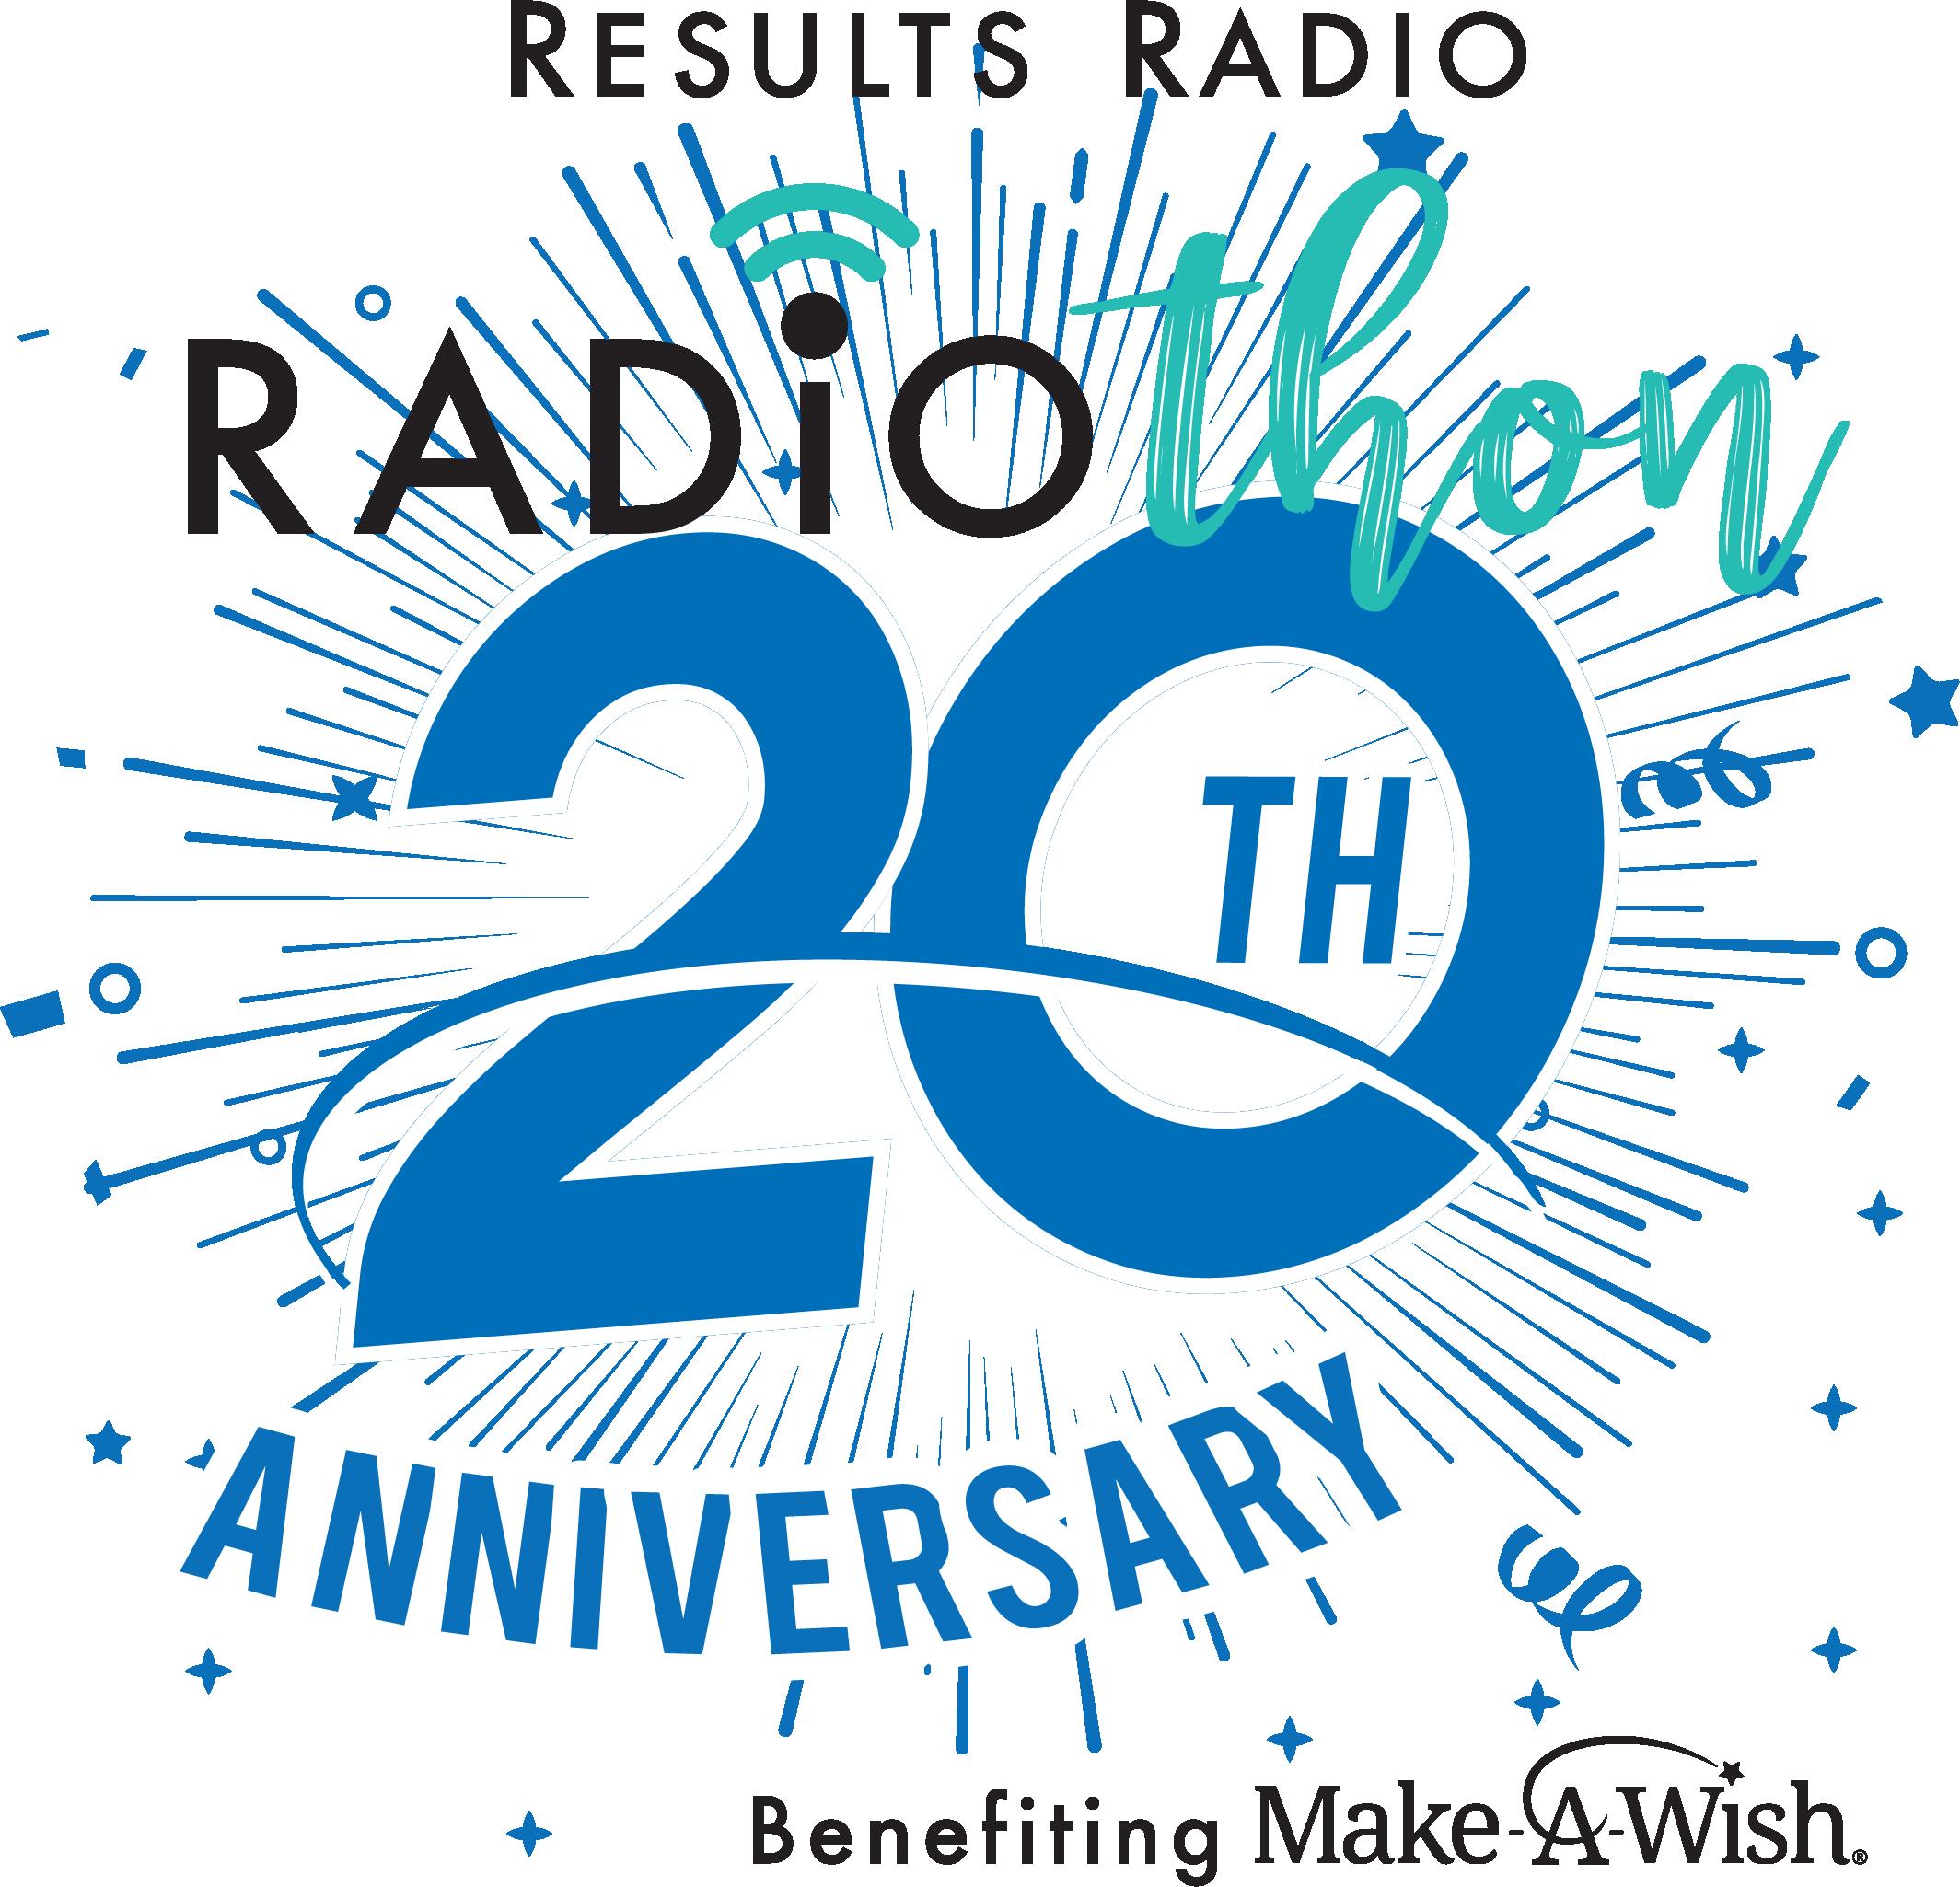 20th anniversary radiothon logo - bk edits